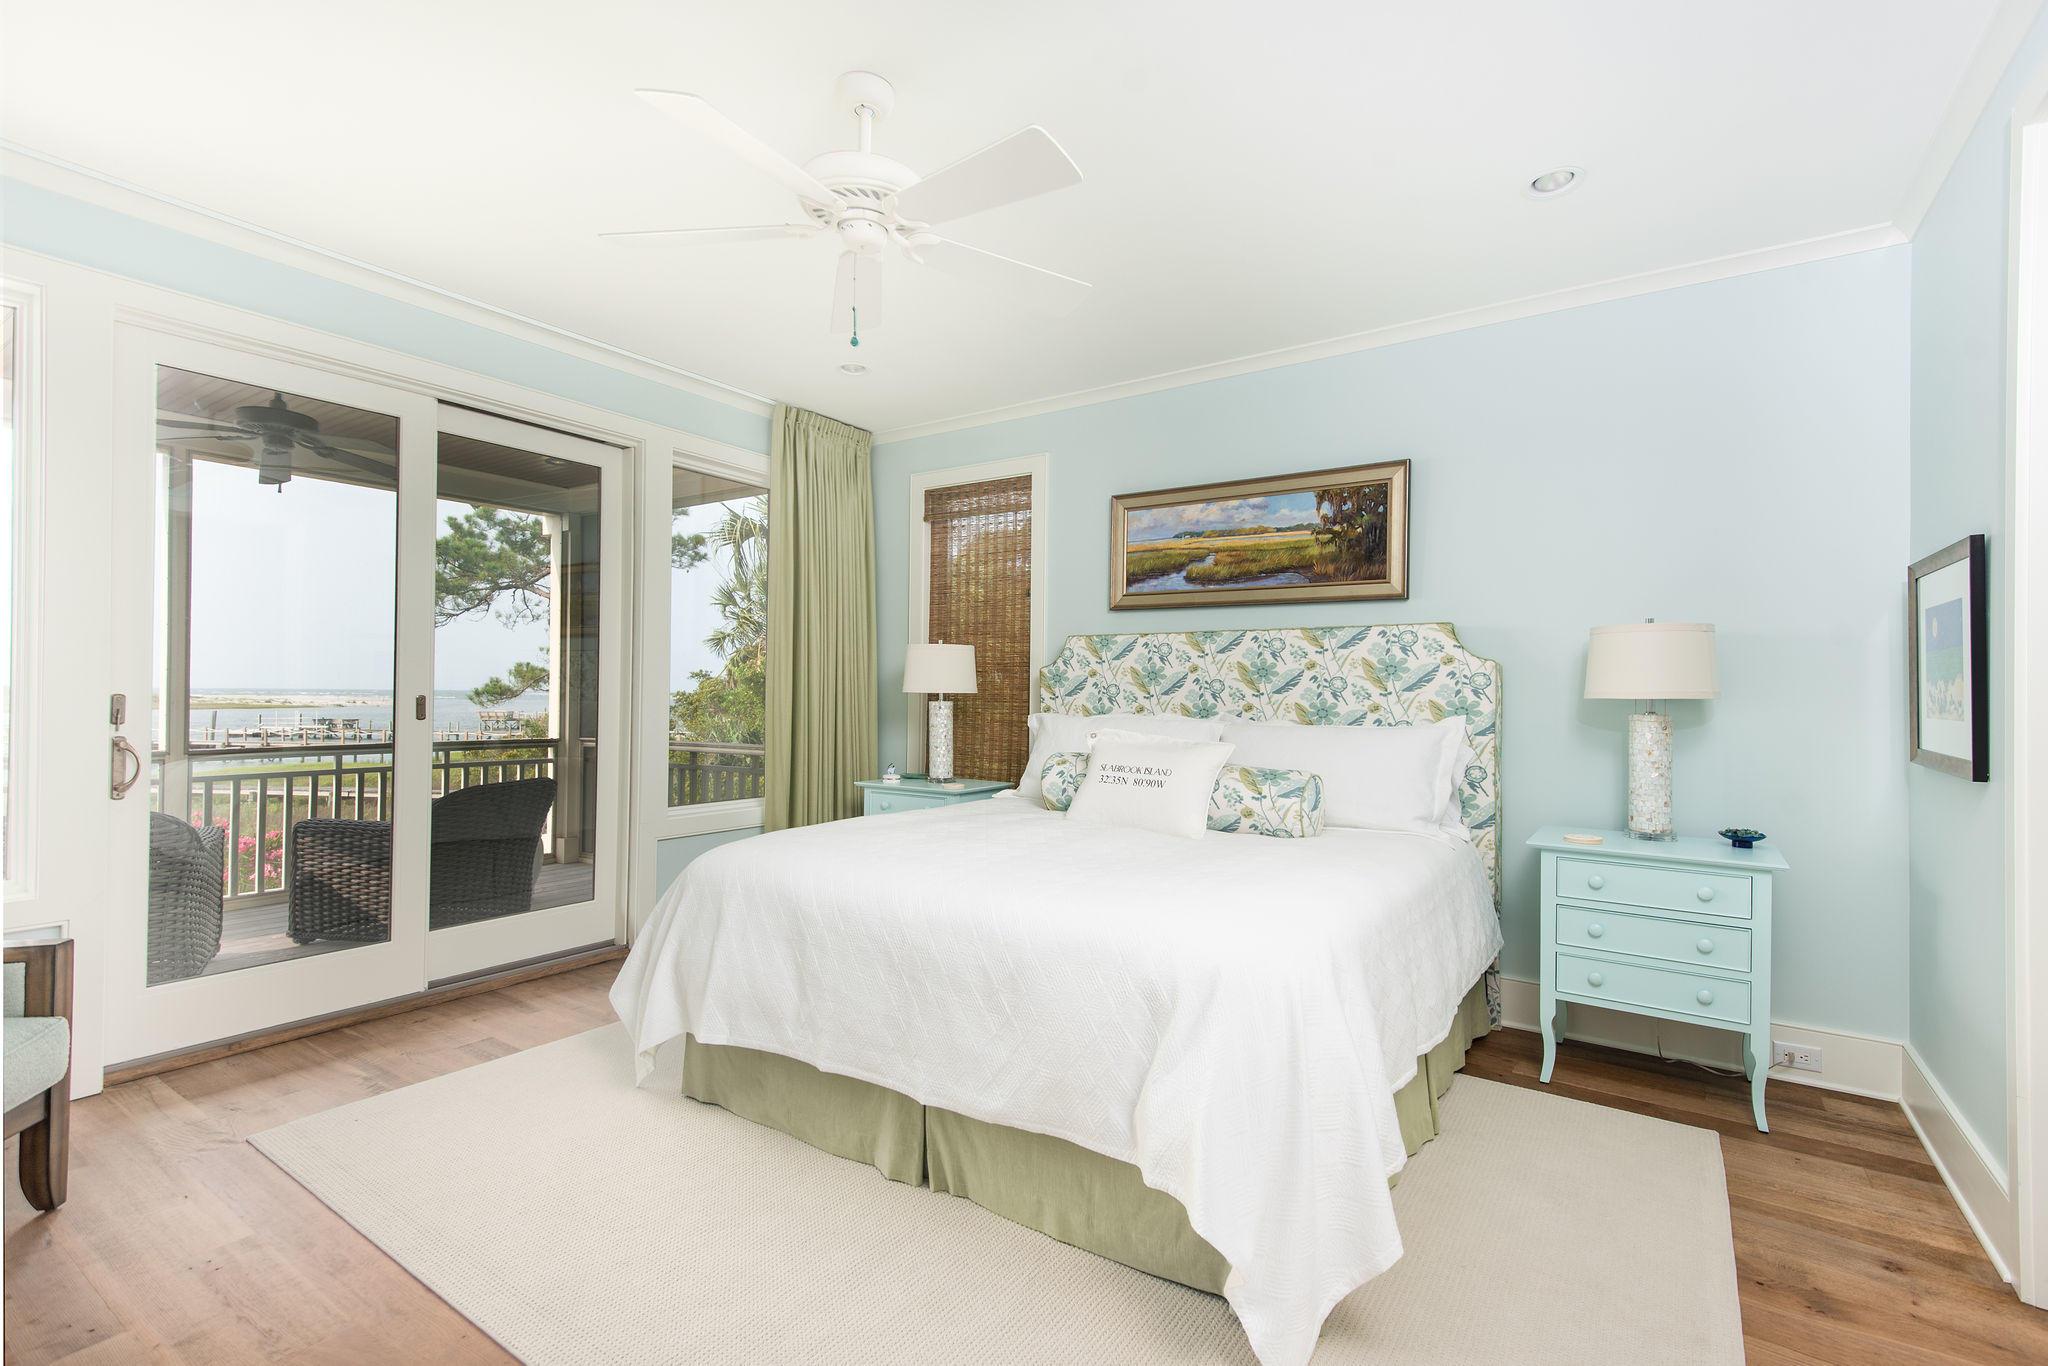 Seabrook Island Homes For Sale - 3135 Marshgate, Seabrook Island, SC - 26